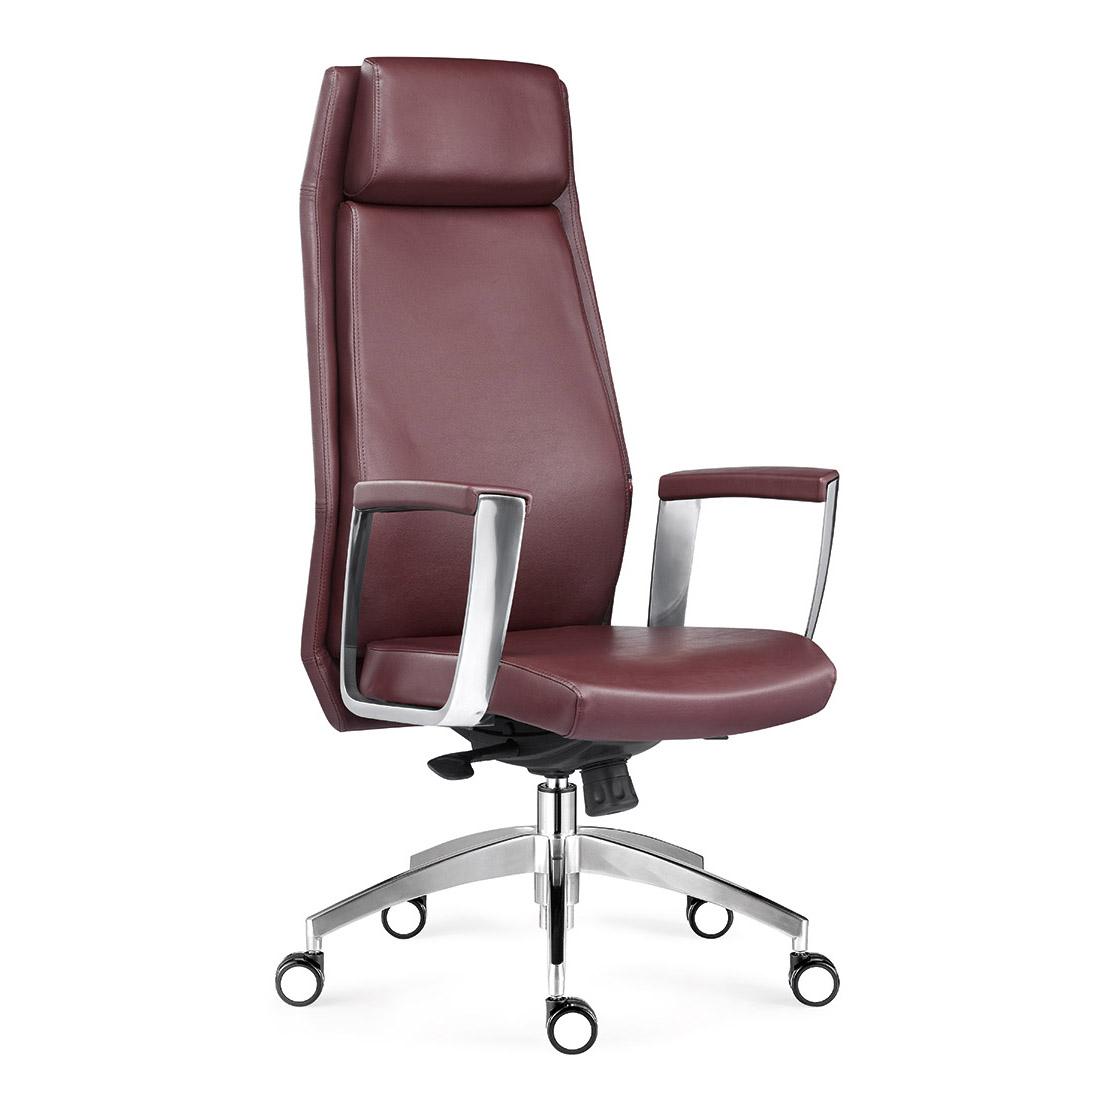 Hangjian Leather Executive Office Chair High Quality Meeting Chair Luxury Executive Swivel Chair Office Furniture Buy Leather Executive Office